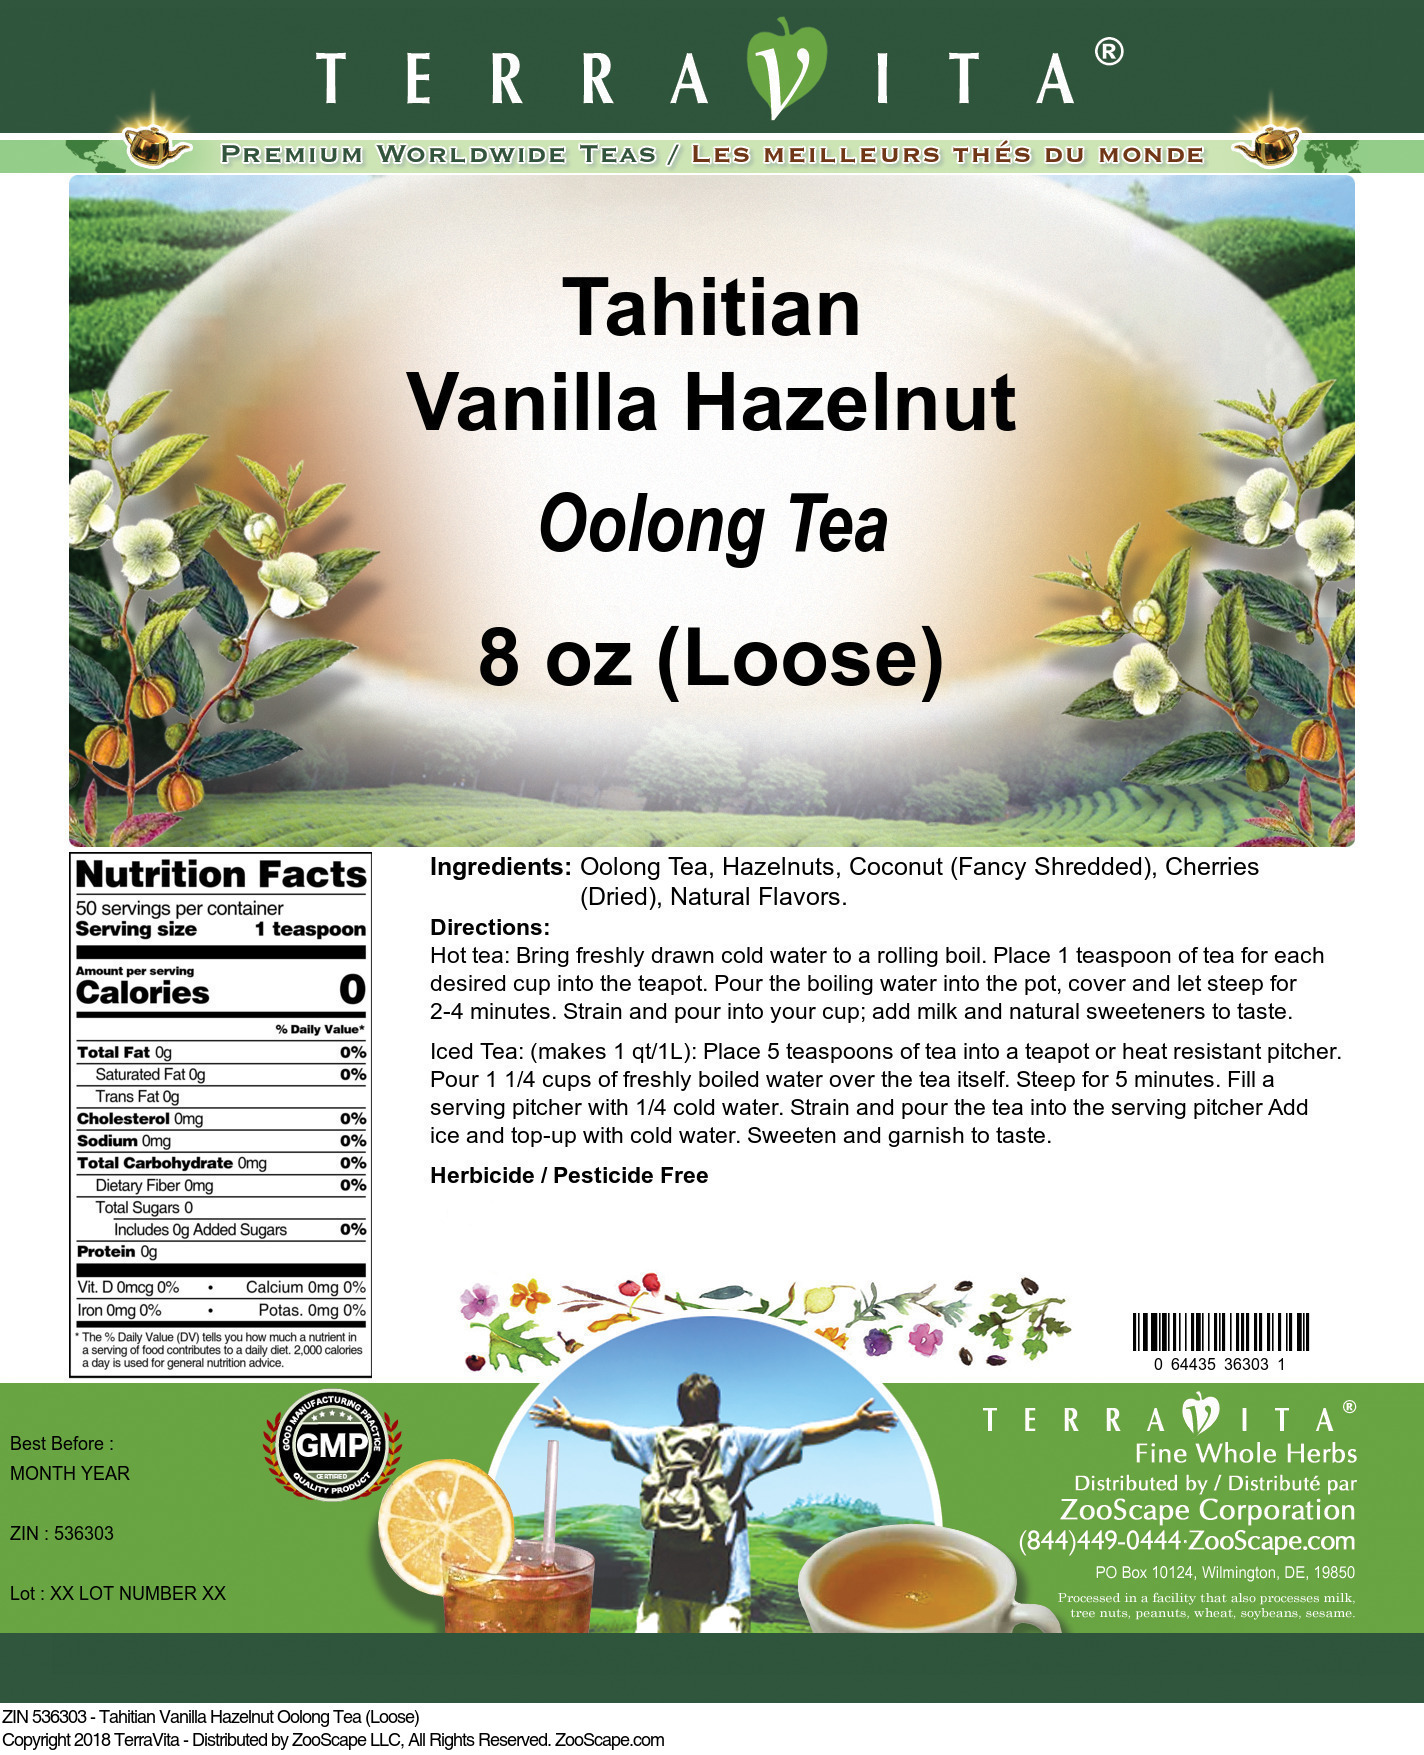 Tahitian Vanilla Hazelnut Oolong Tea (Loose)